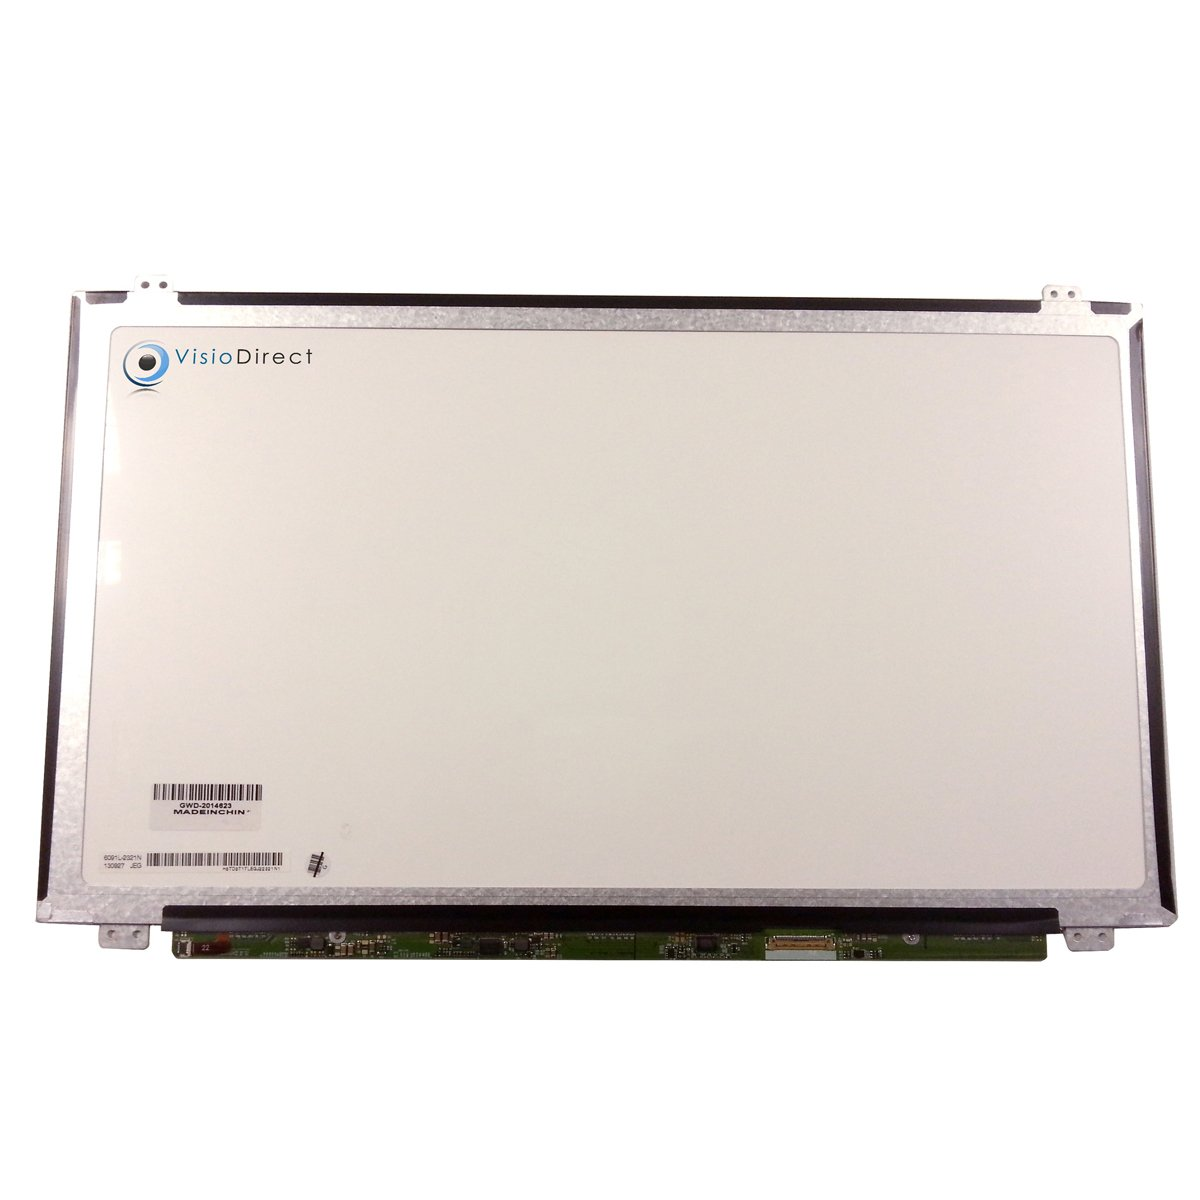 Visiodirect® Bildschirm LCD Display 15.6' LED für Laptop LENOVO IDEAPAD 110-15ISK